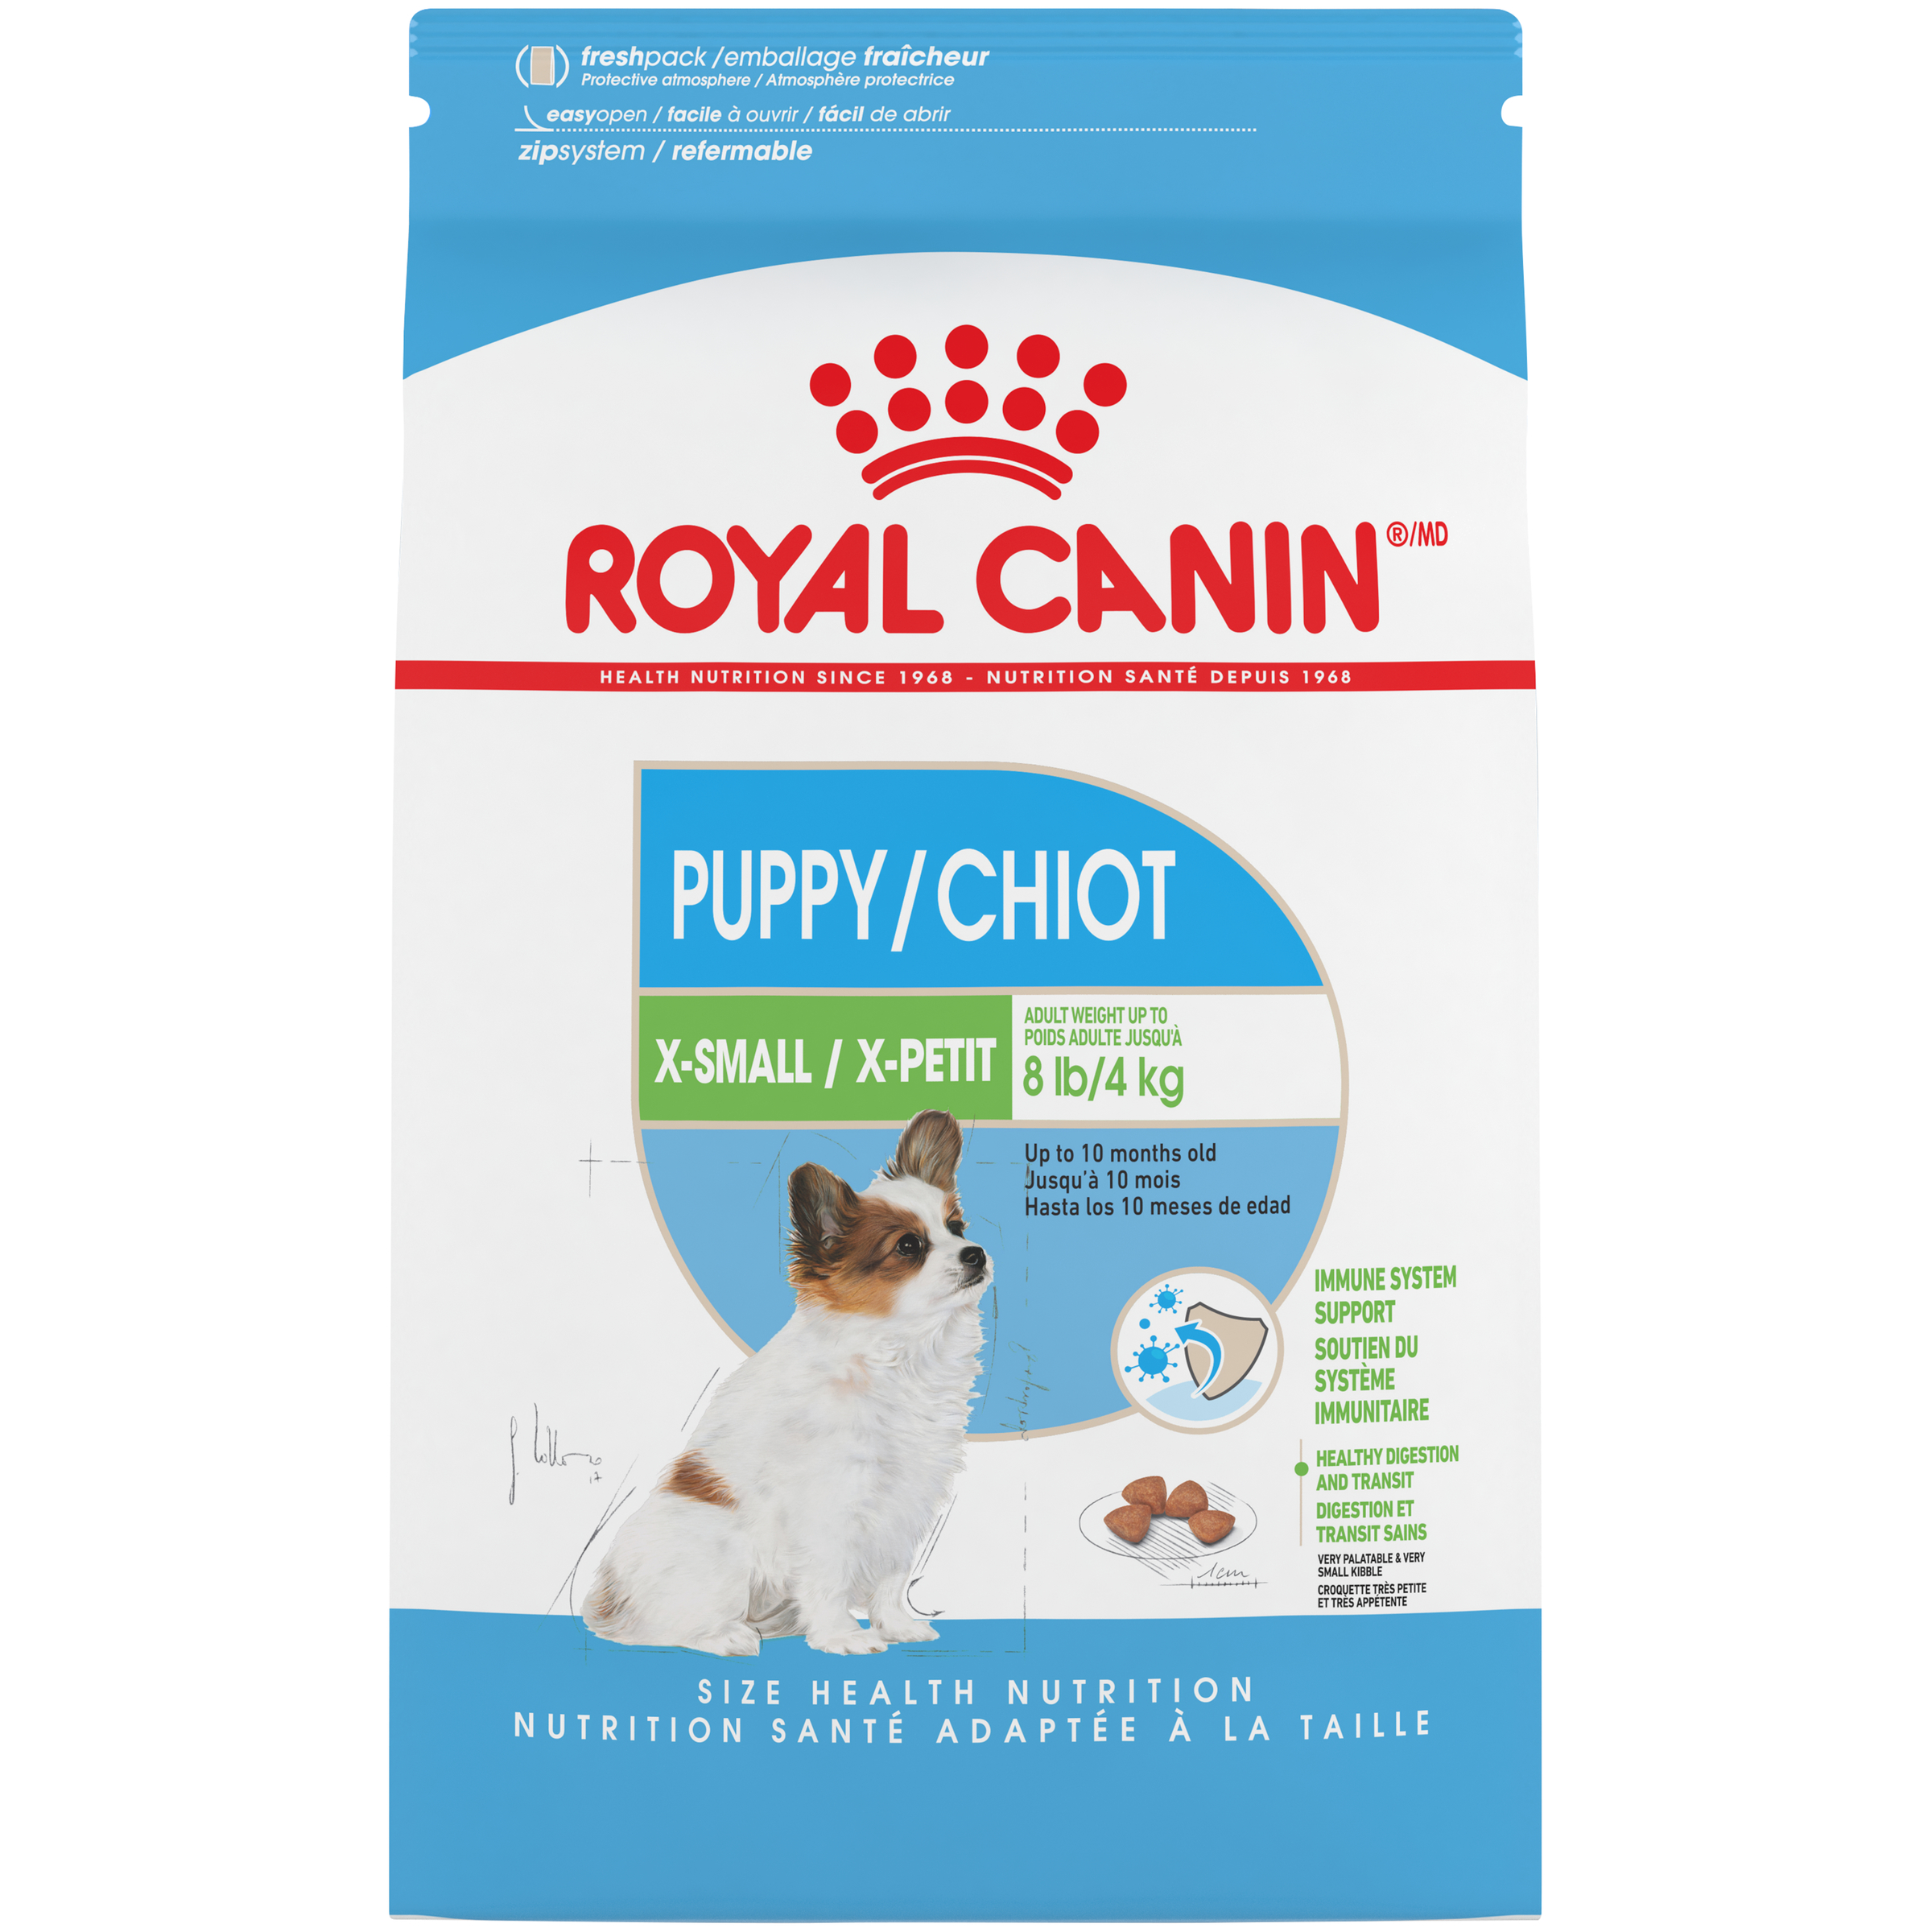 Royal Canin Small Breed Puppy Formula Dry Dog Food, 15 lb